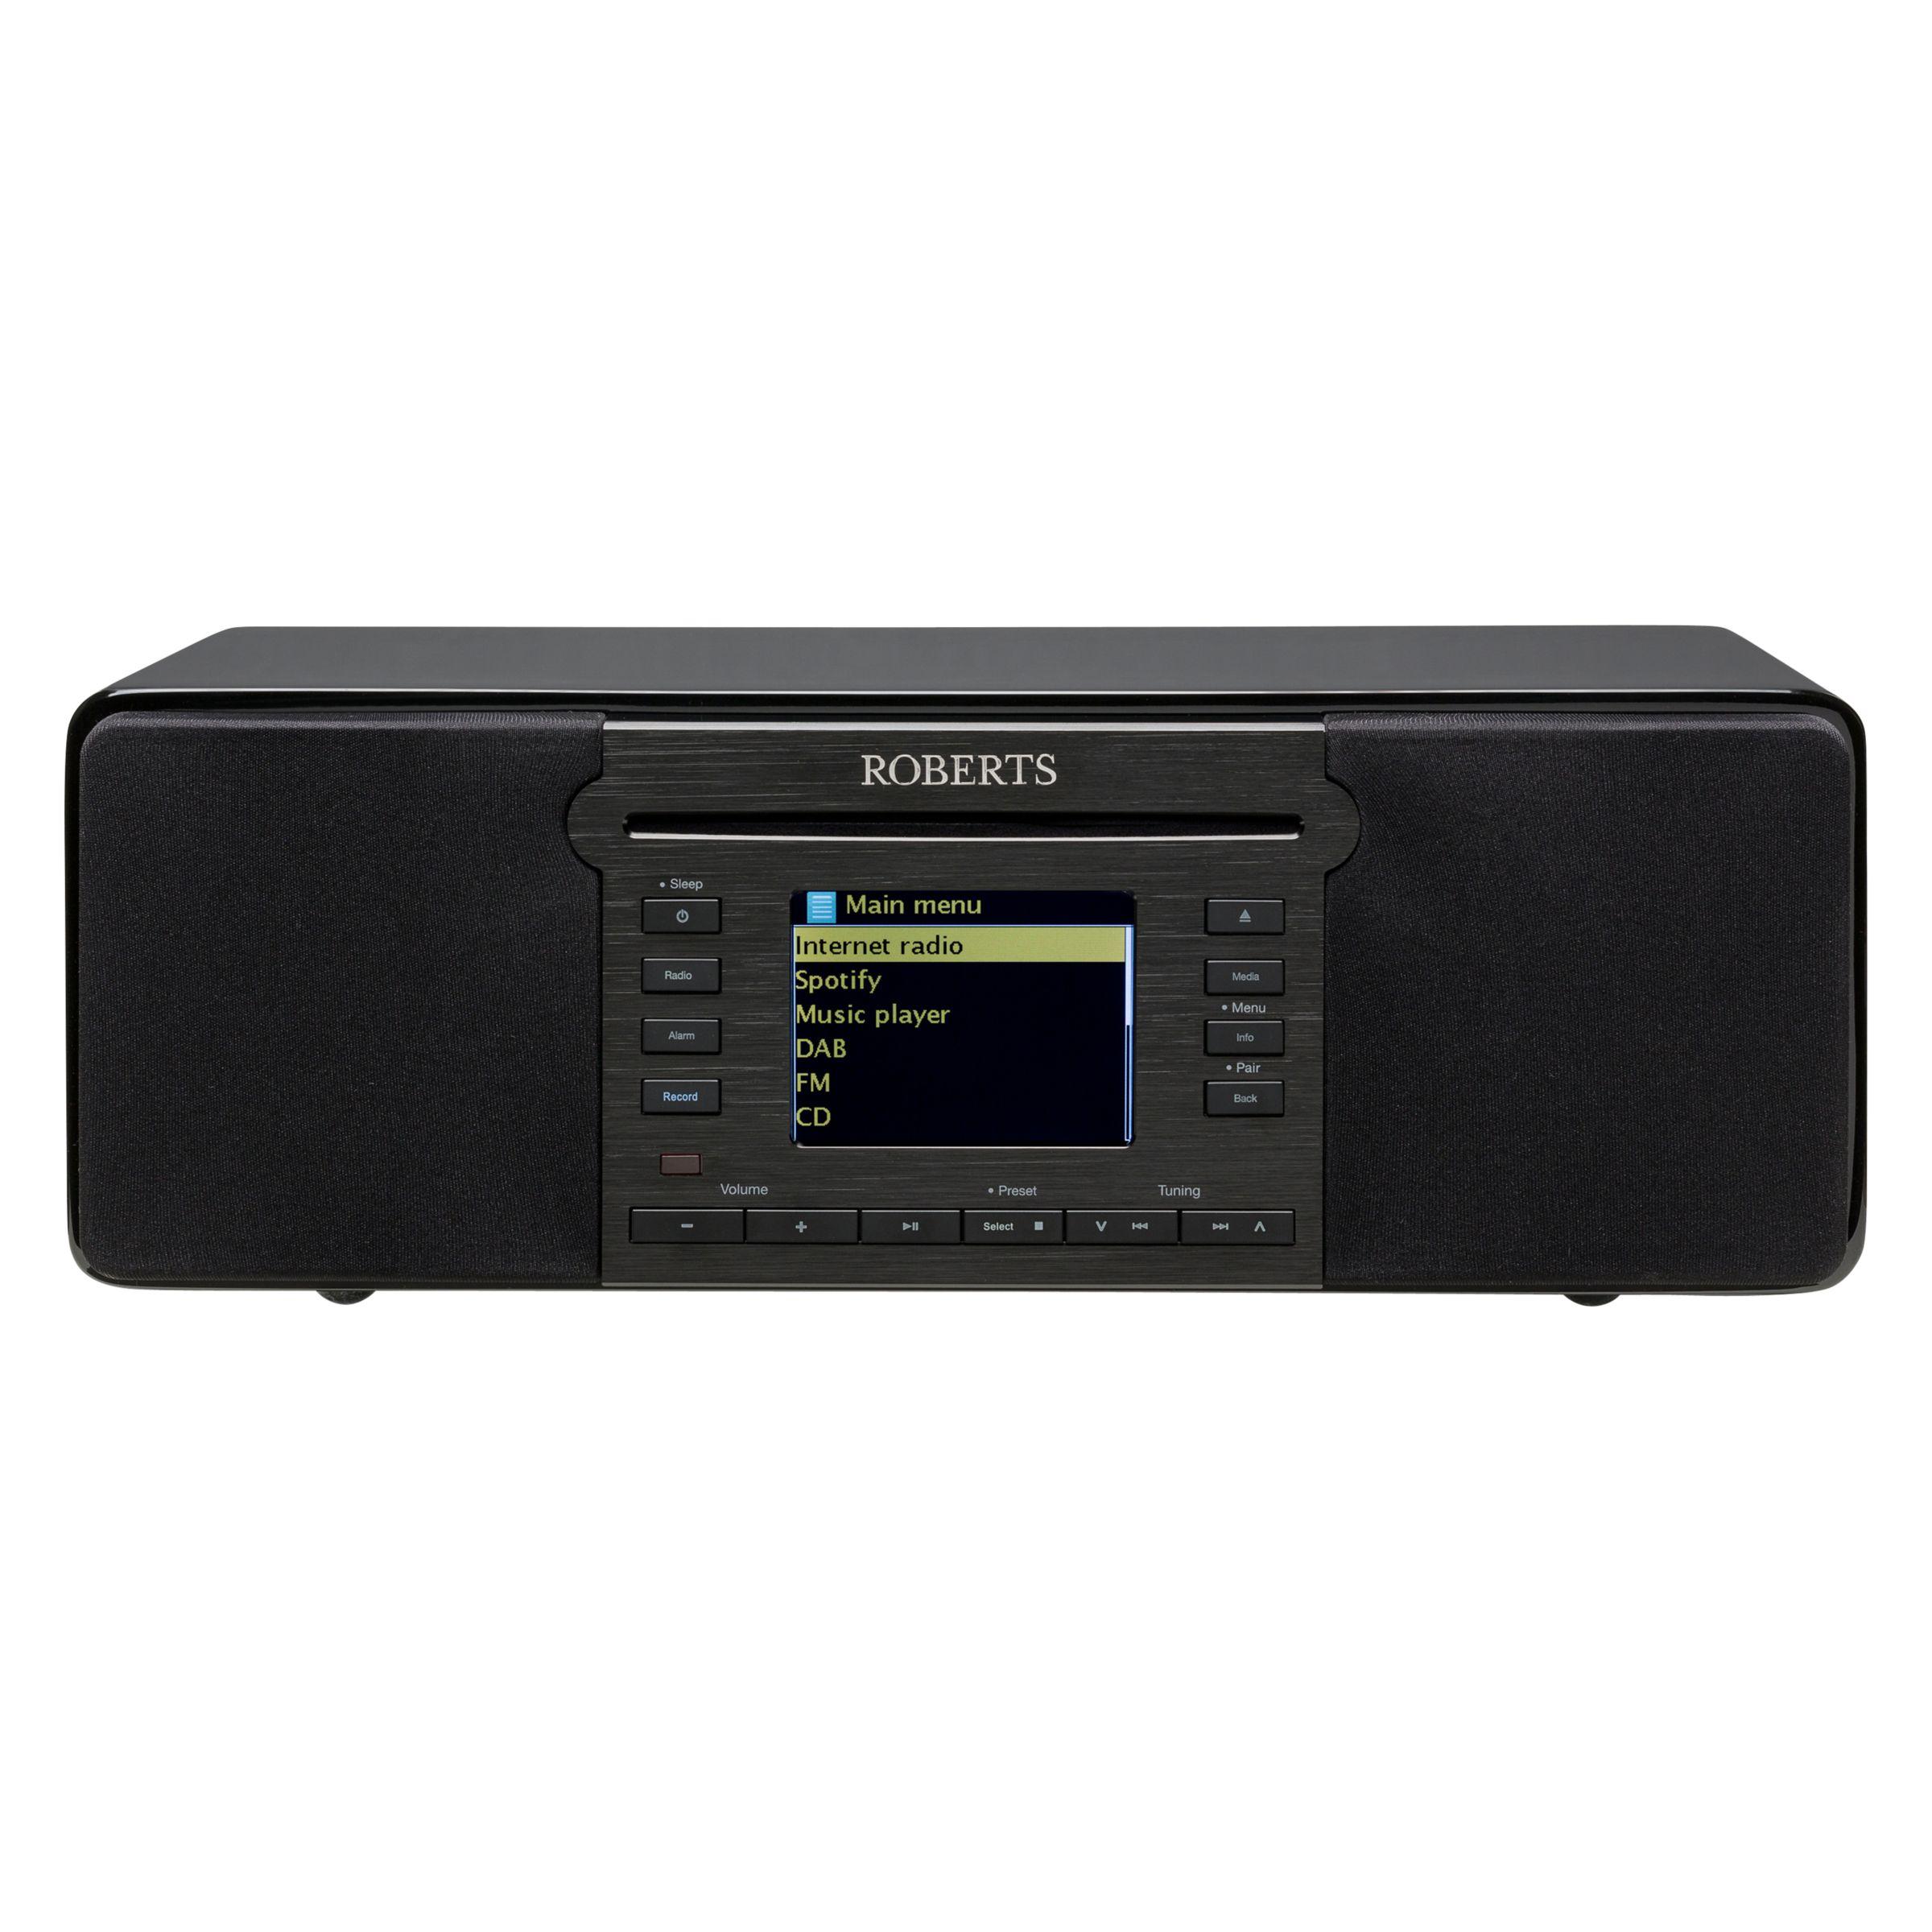 Roberts ROBERTS Stream 65i DAB+/FM CD Smart Multi-Room Radio With Wi-Fi, Bluetooth & Internet Radio